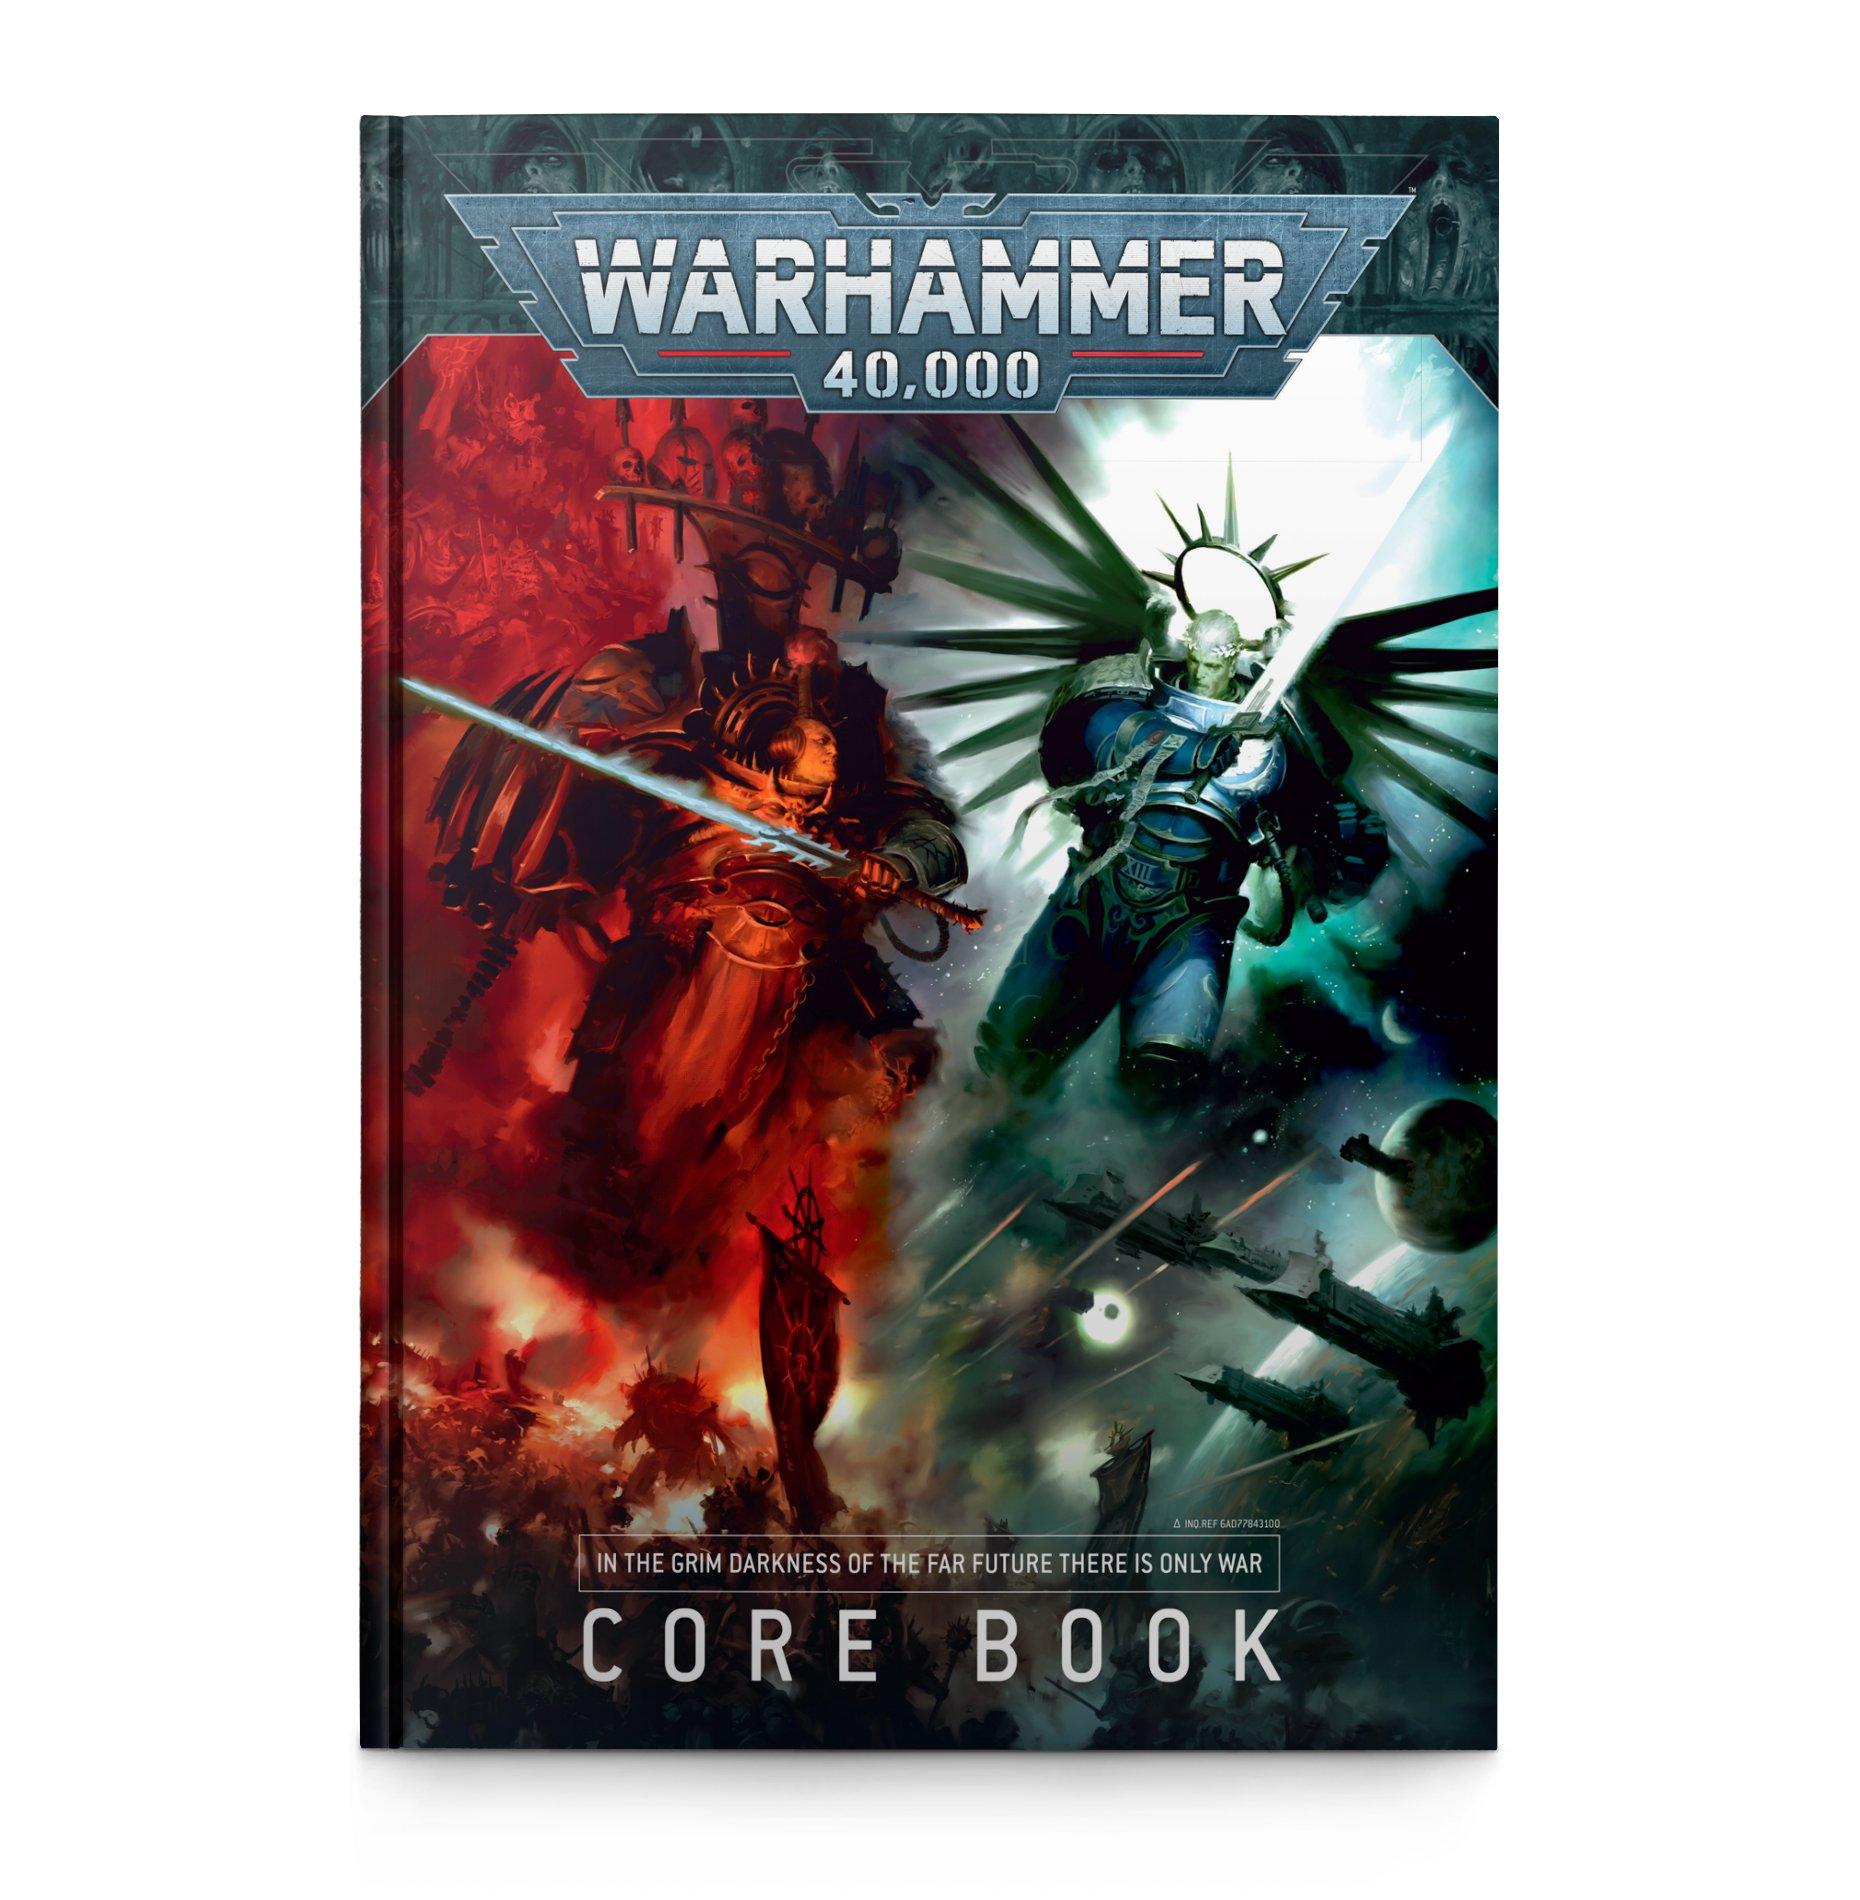 Core Book, Warhammer 40,000